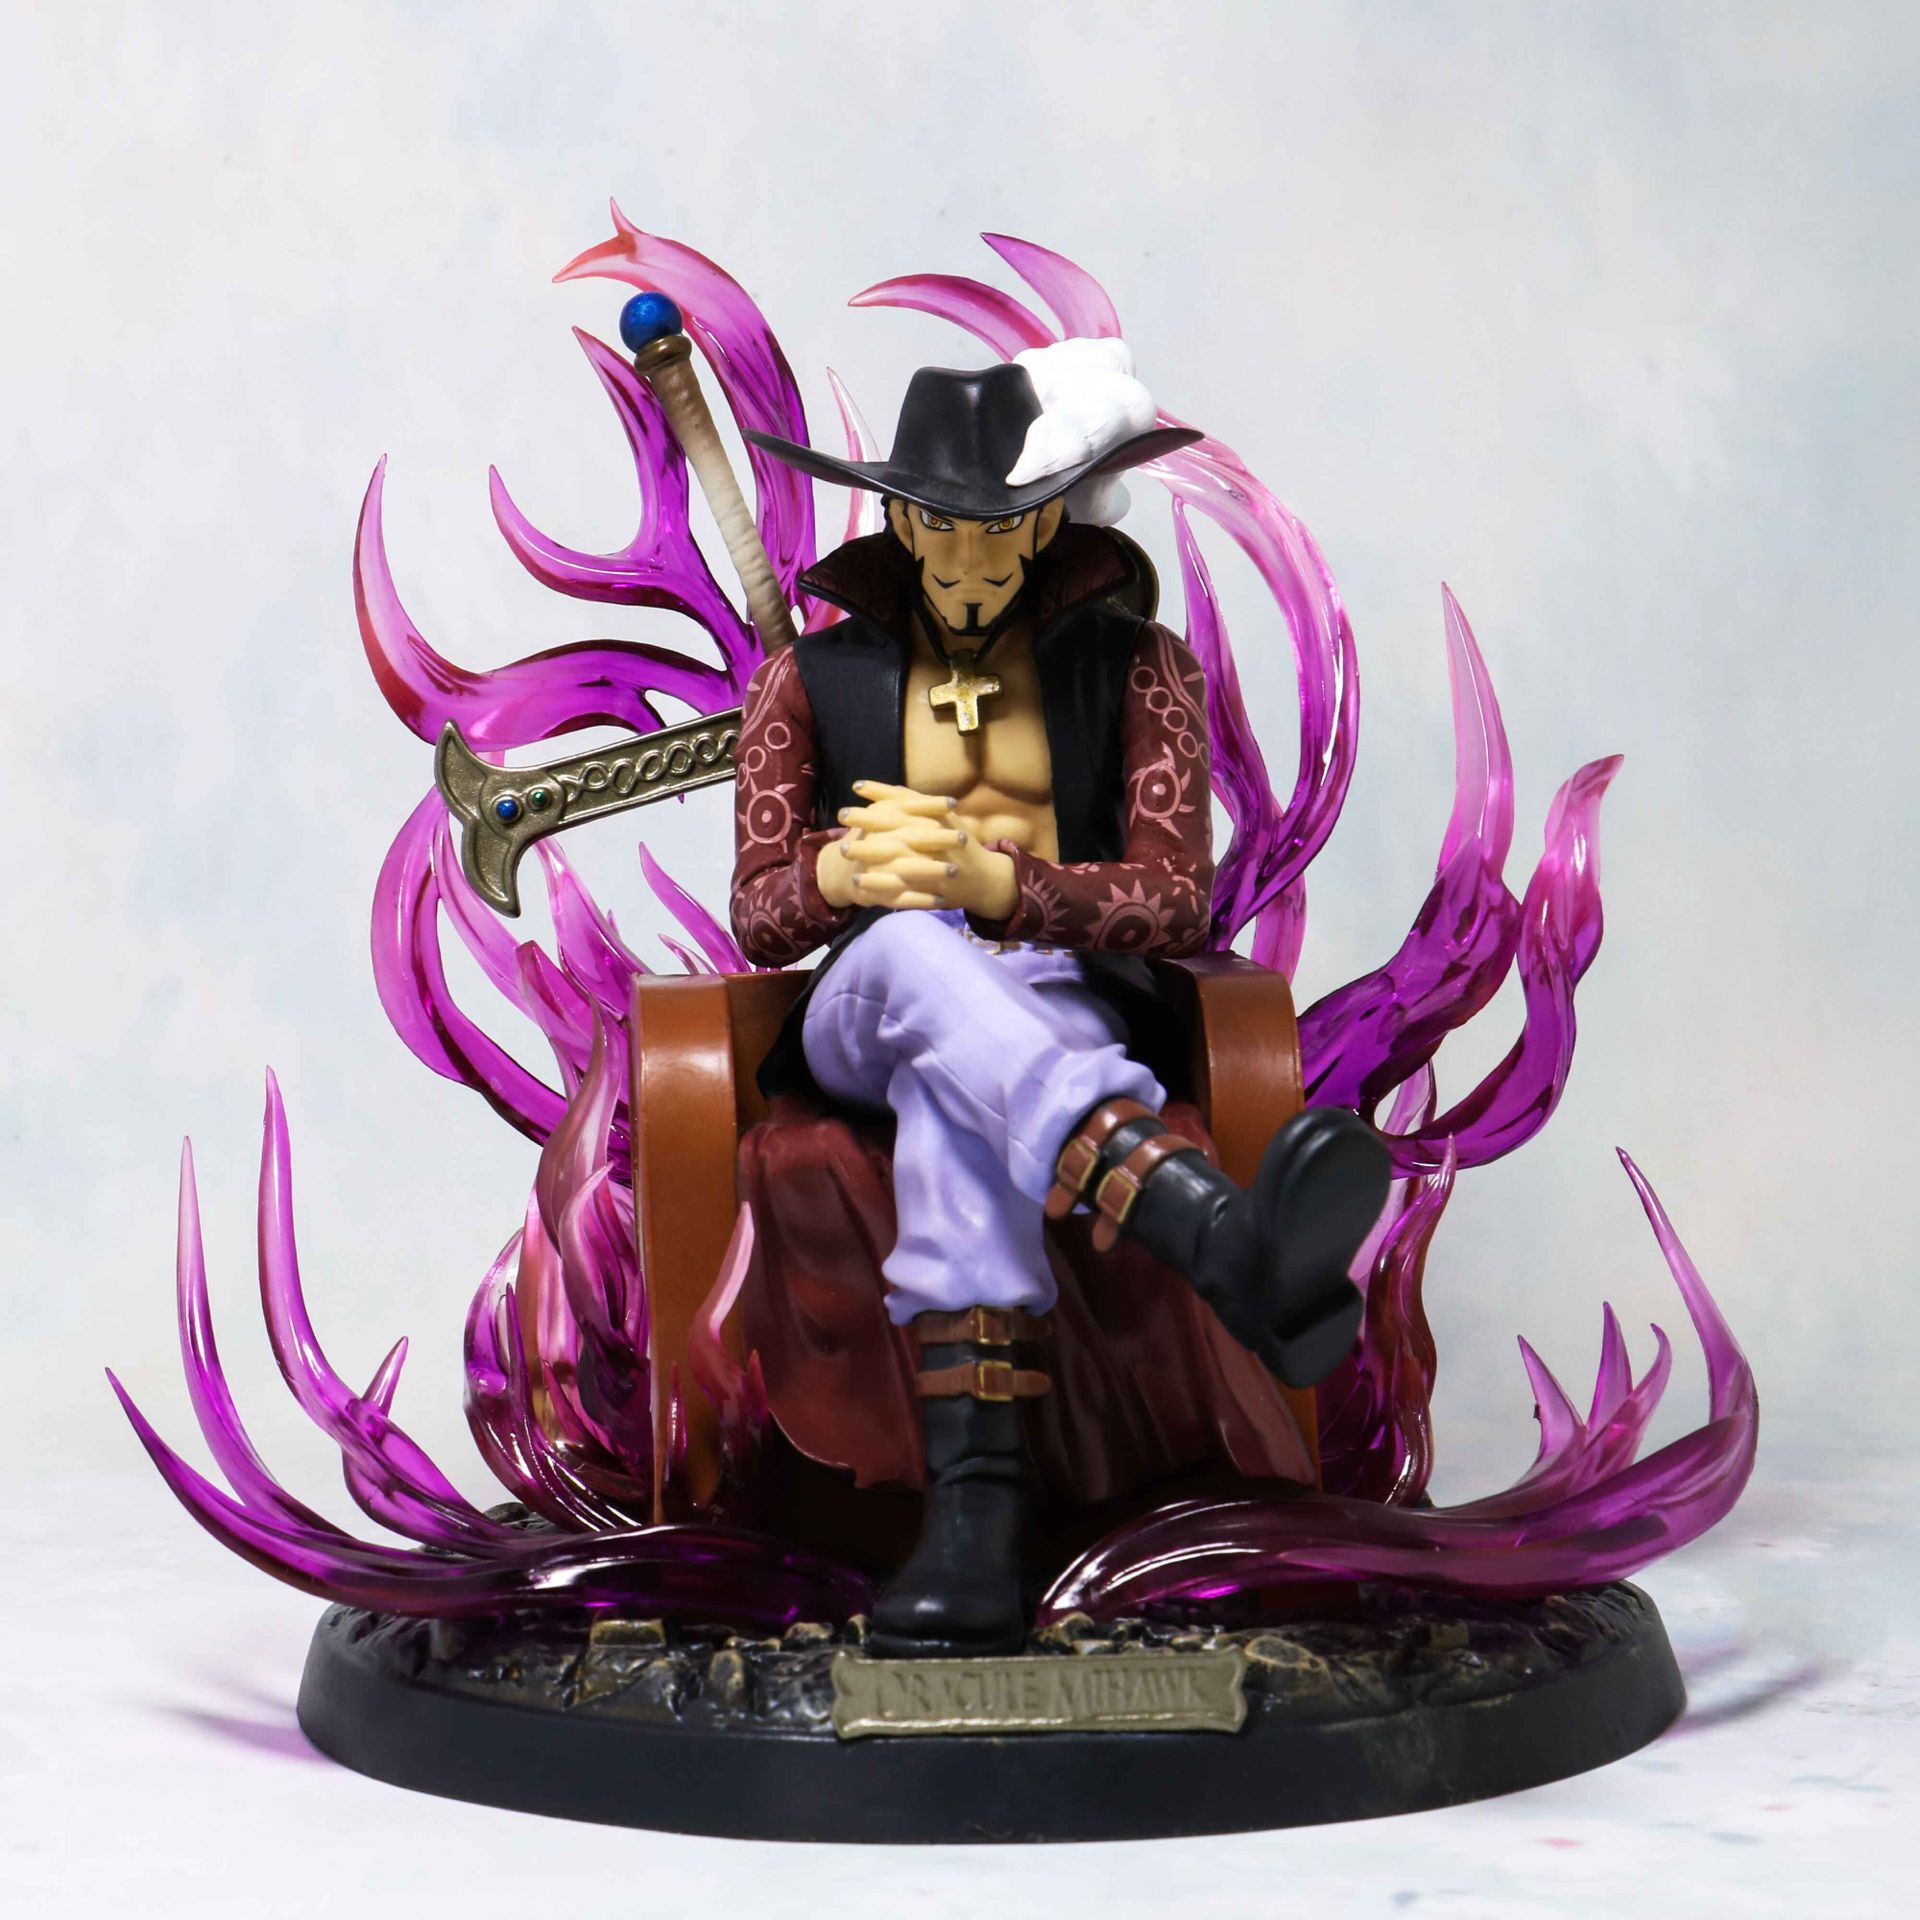 20cm Anime One Piece GK Dracule Mihawk Action Figure Collection Models Toys